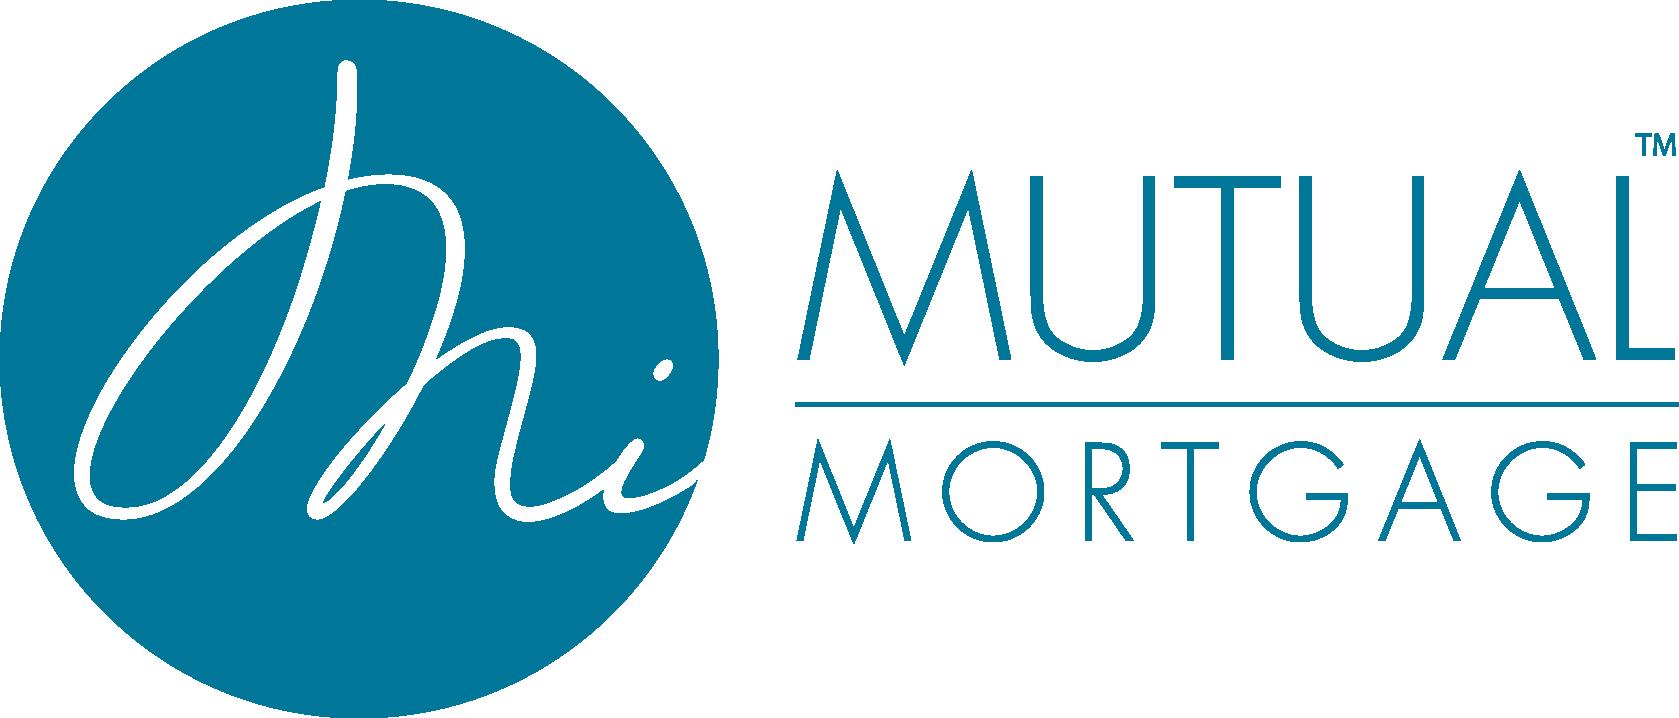 new retail mimutual logo